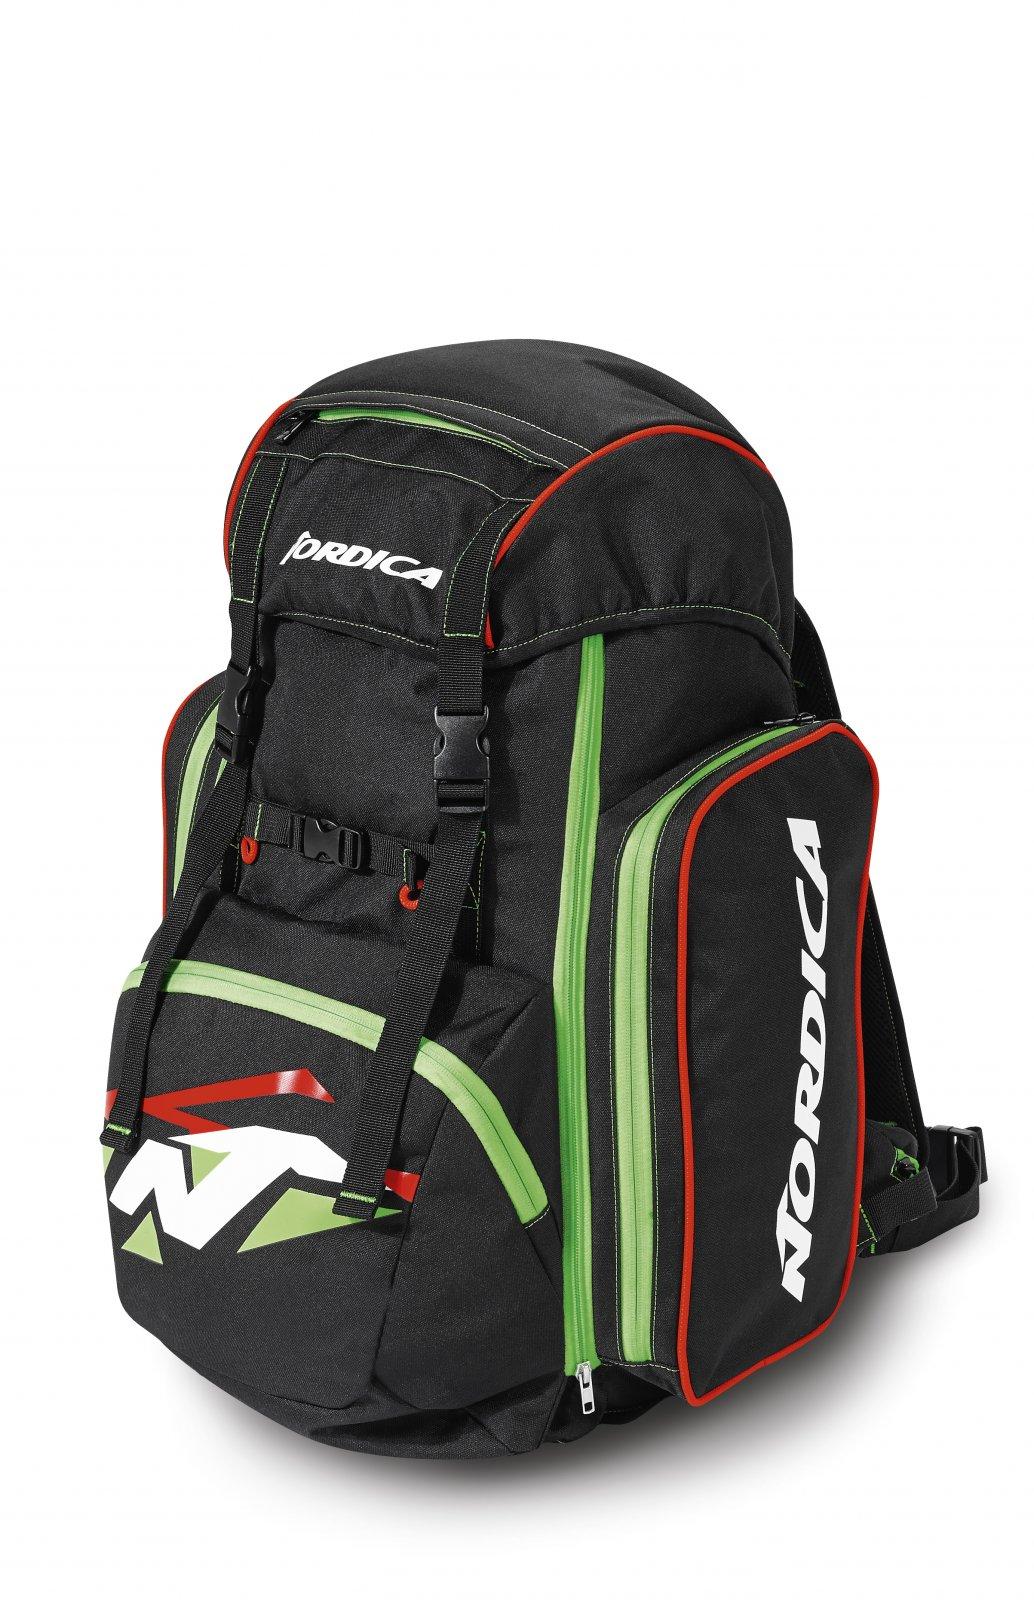 Nordica Race Backpack